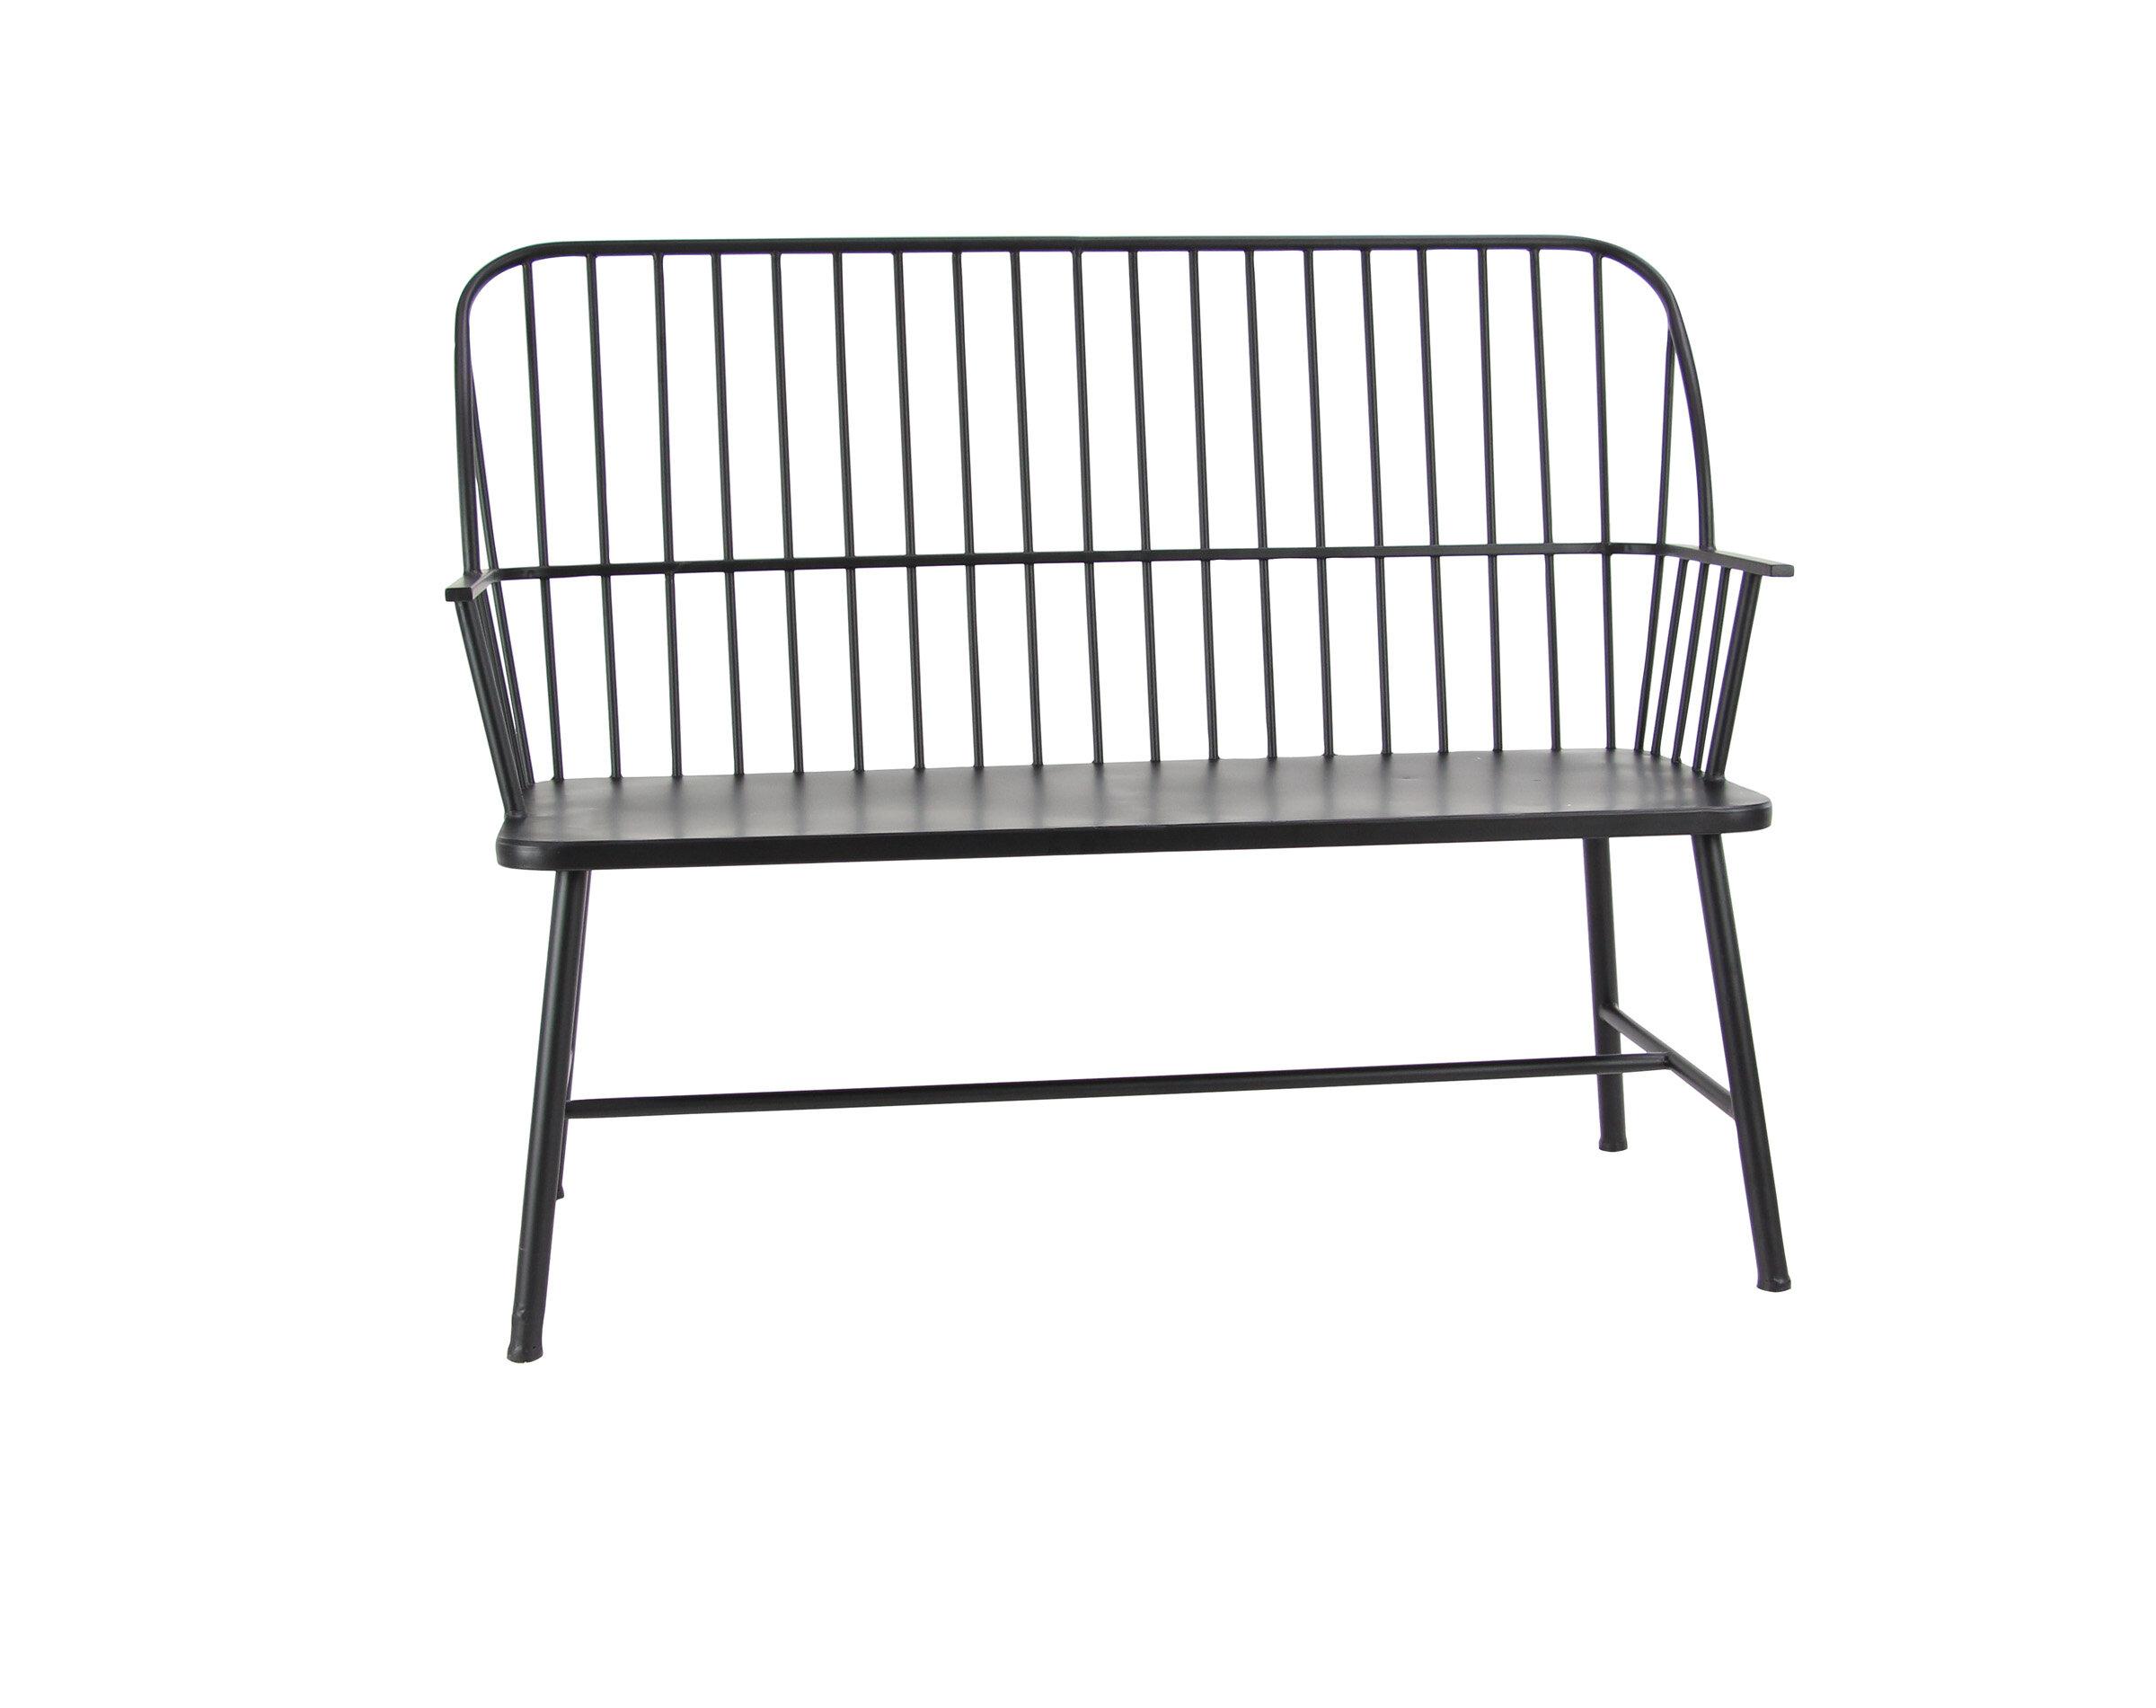 Gehlert Traditional Patio Iron Garden Bench Regarding Michelle Metal Garden Benches (View 13 of 25)